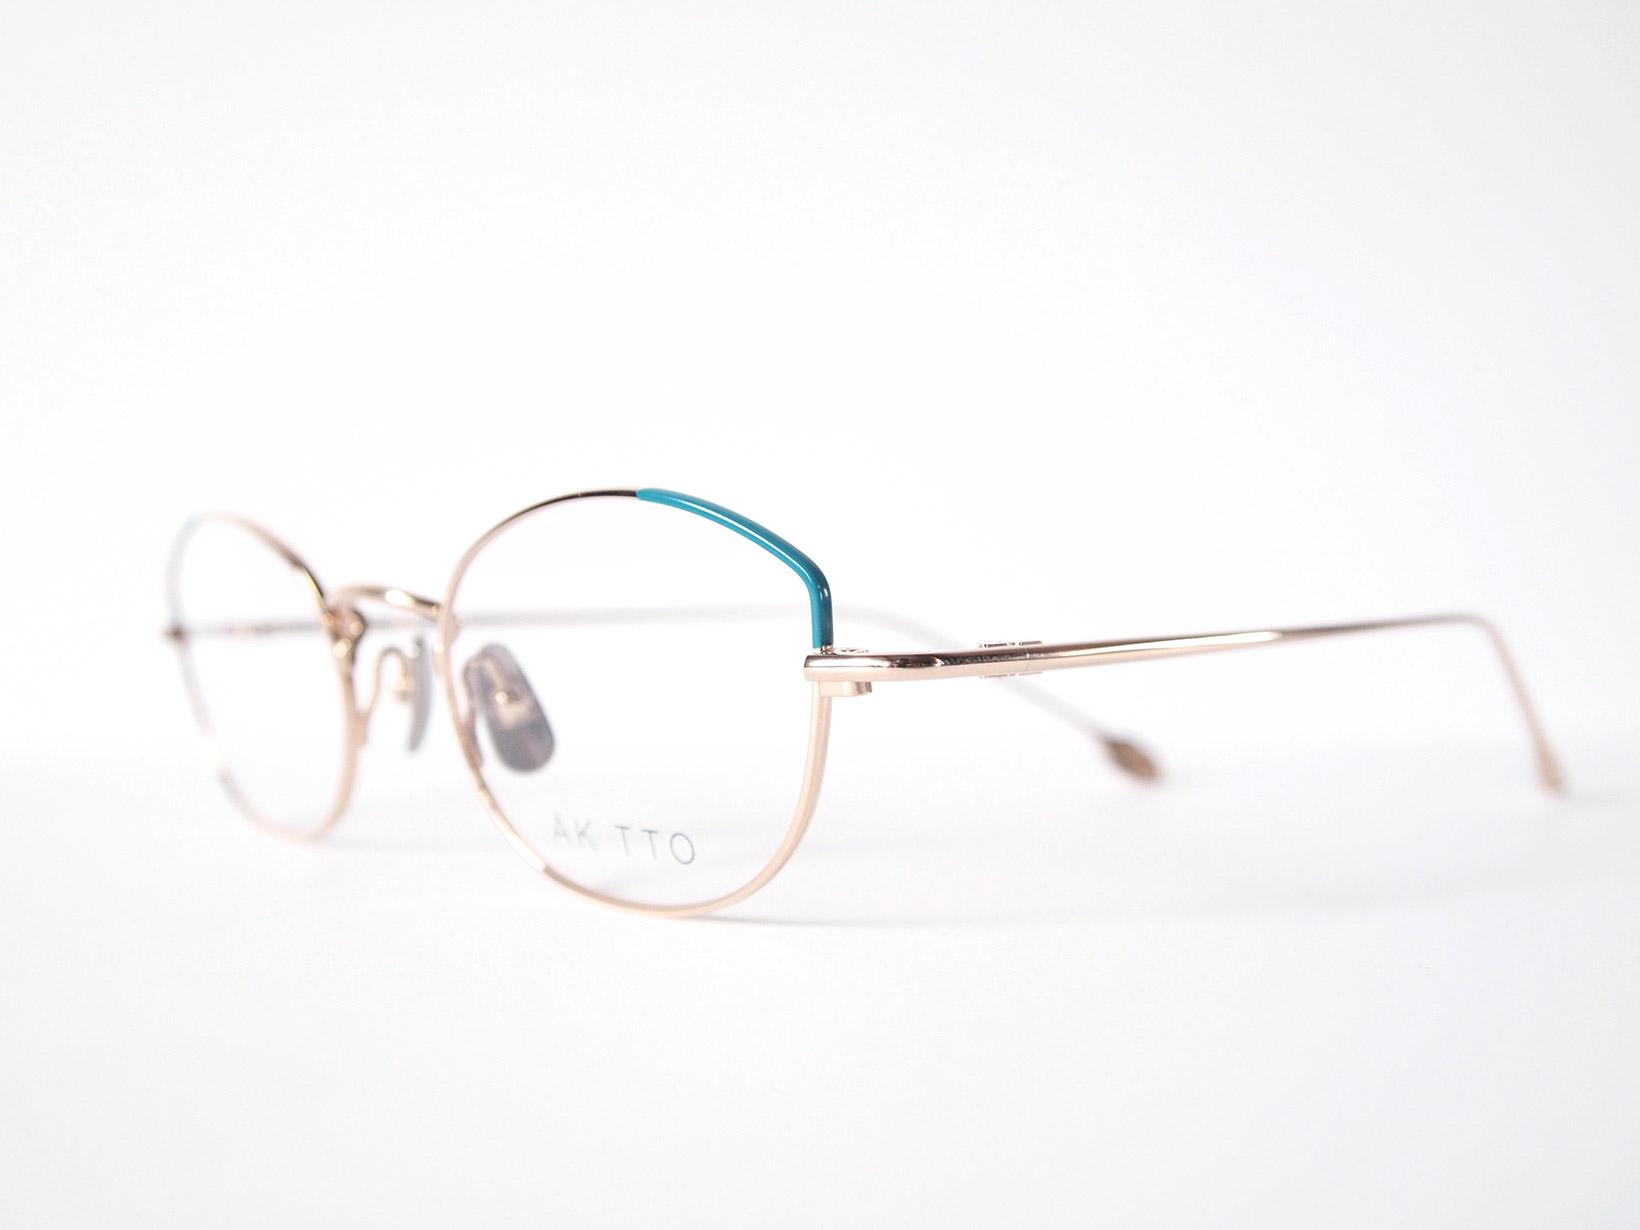 AKITTO 2017-4th pin2 color|SG size:47□20 material:titanium price:¥42,000-(+tax)